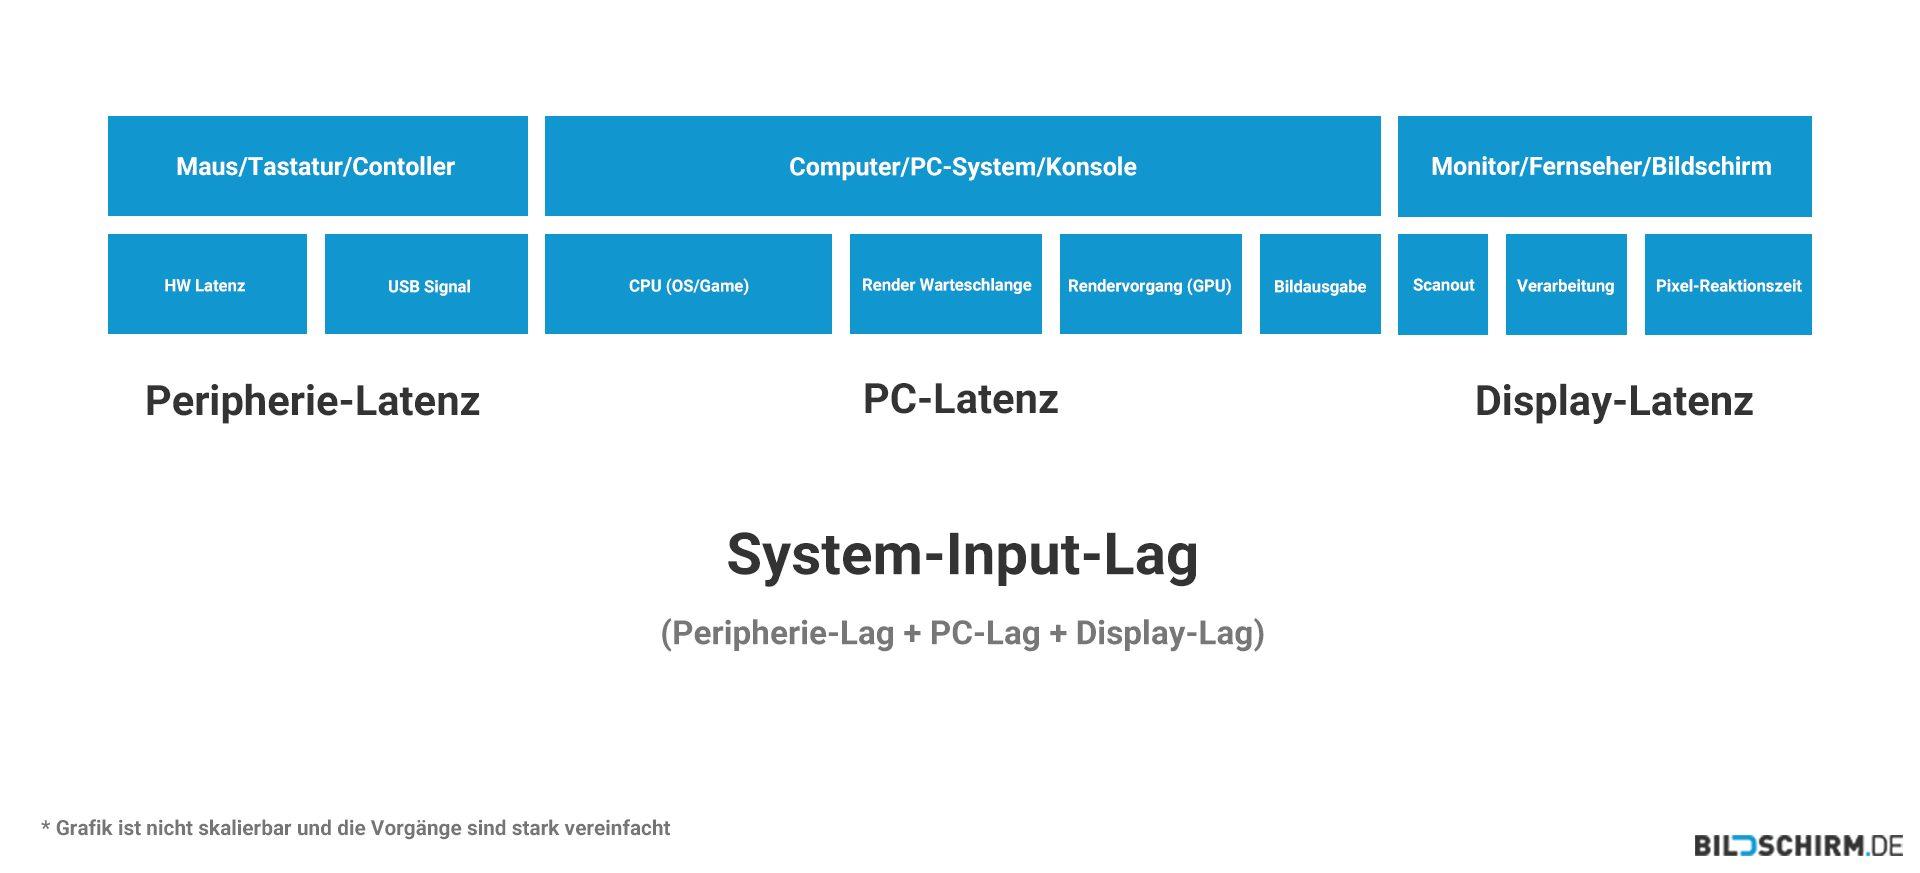 Input-Lag - System Lag Grafik